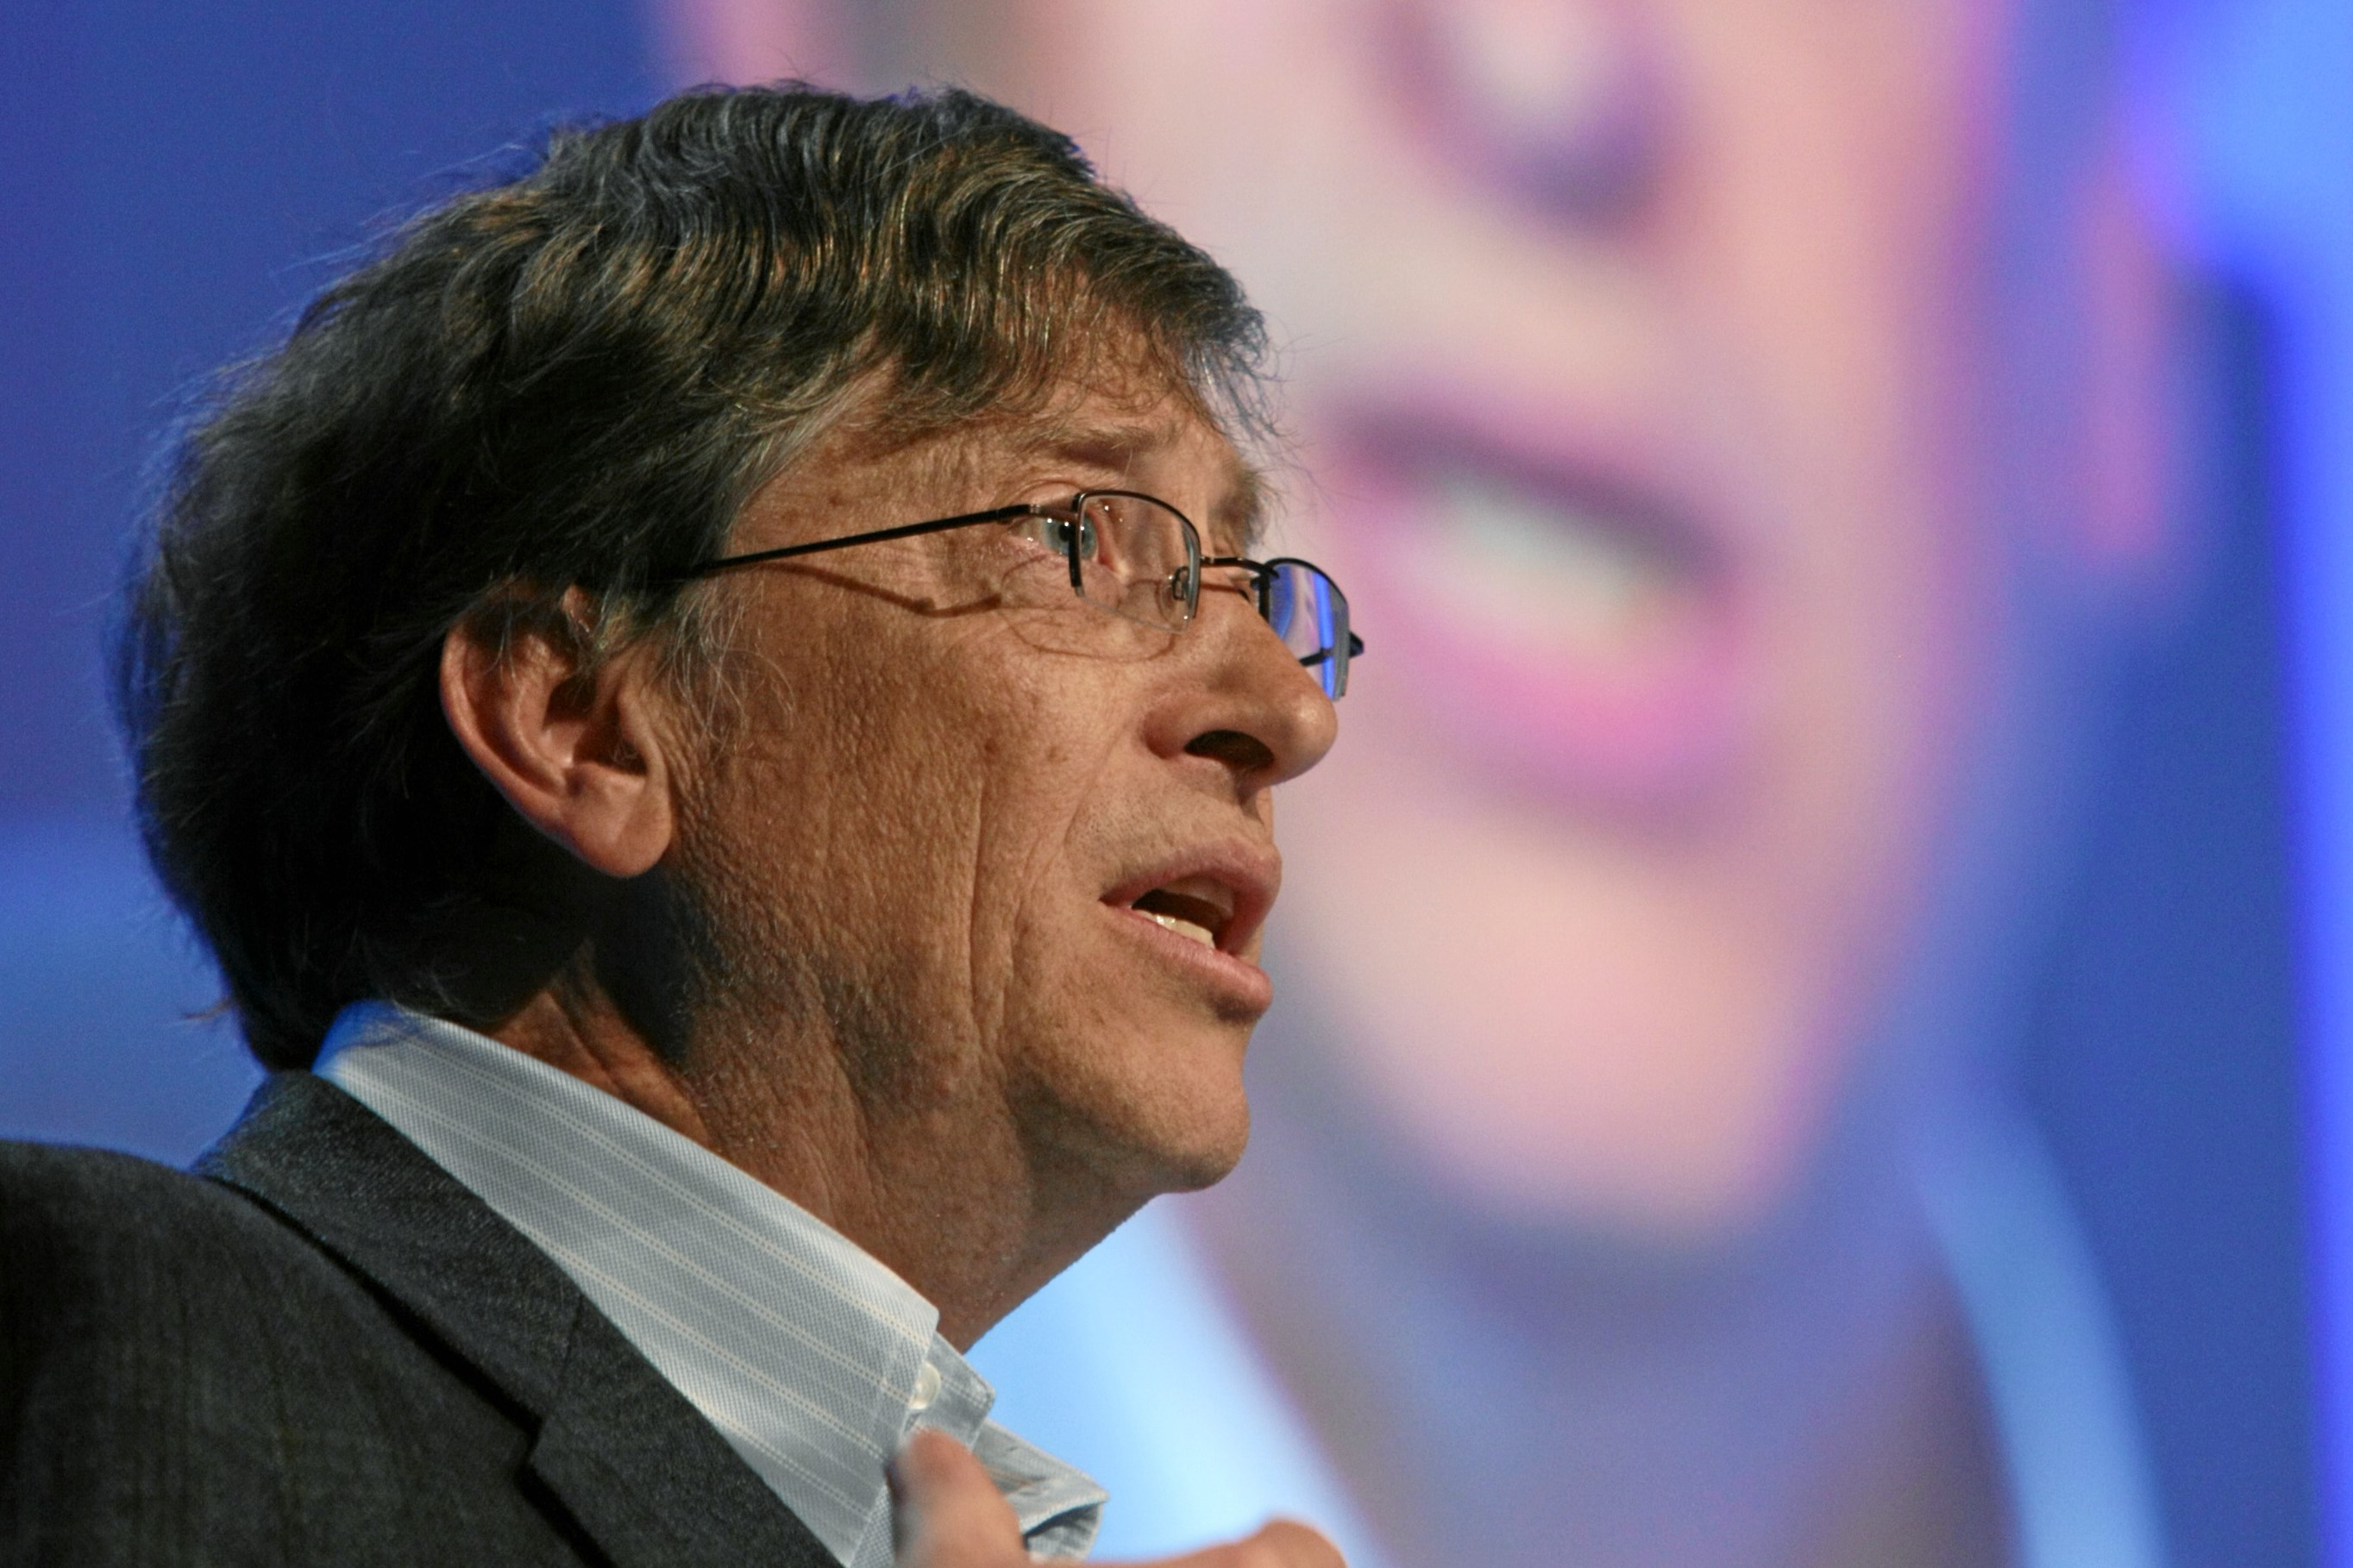 Gates urged capitalists to save lives